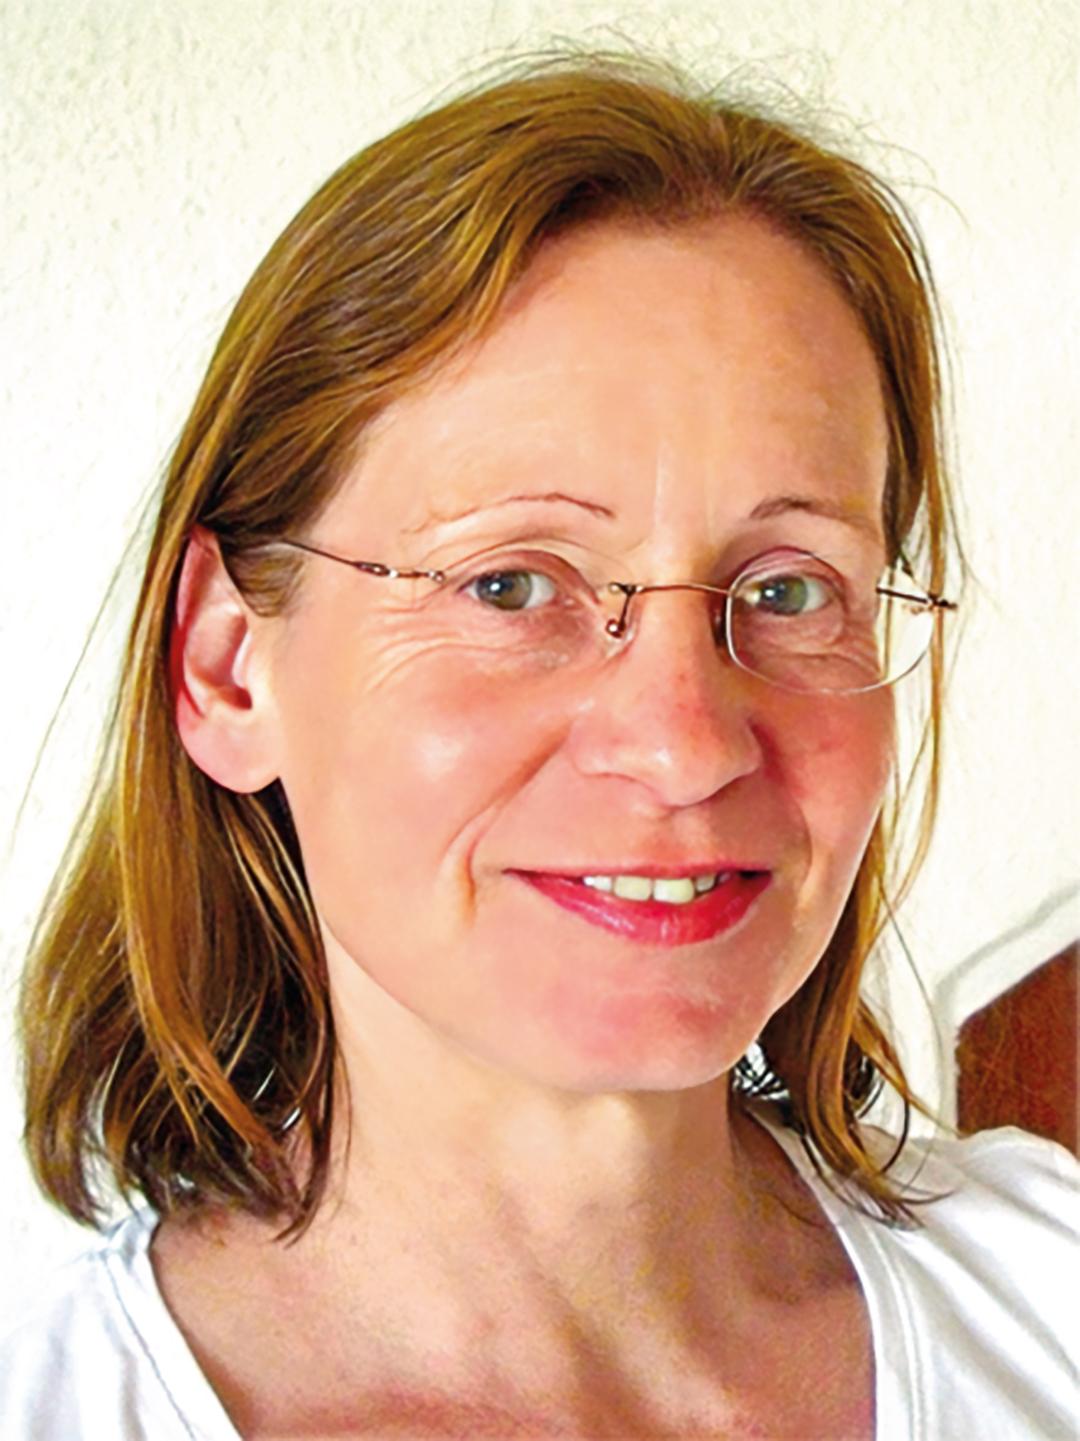 Claudia Persche